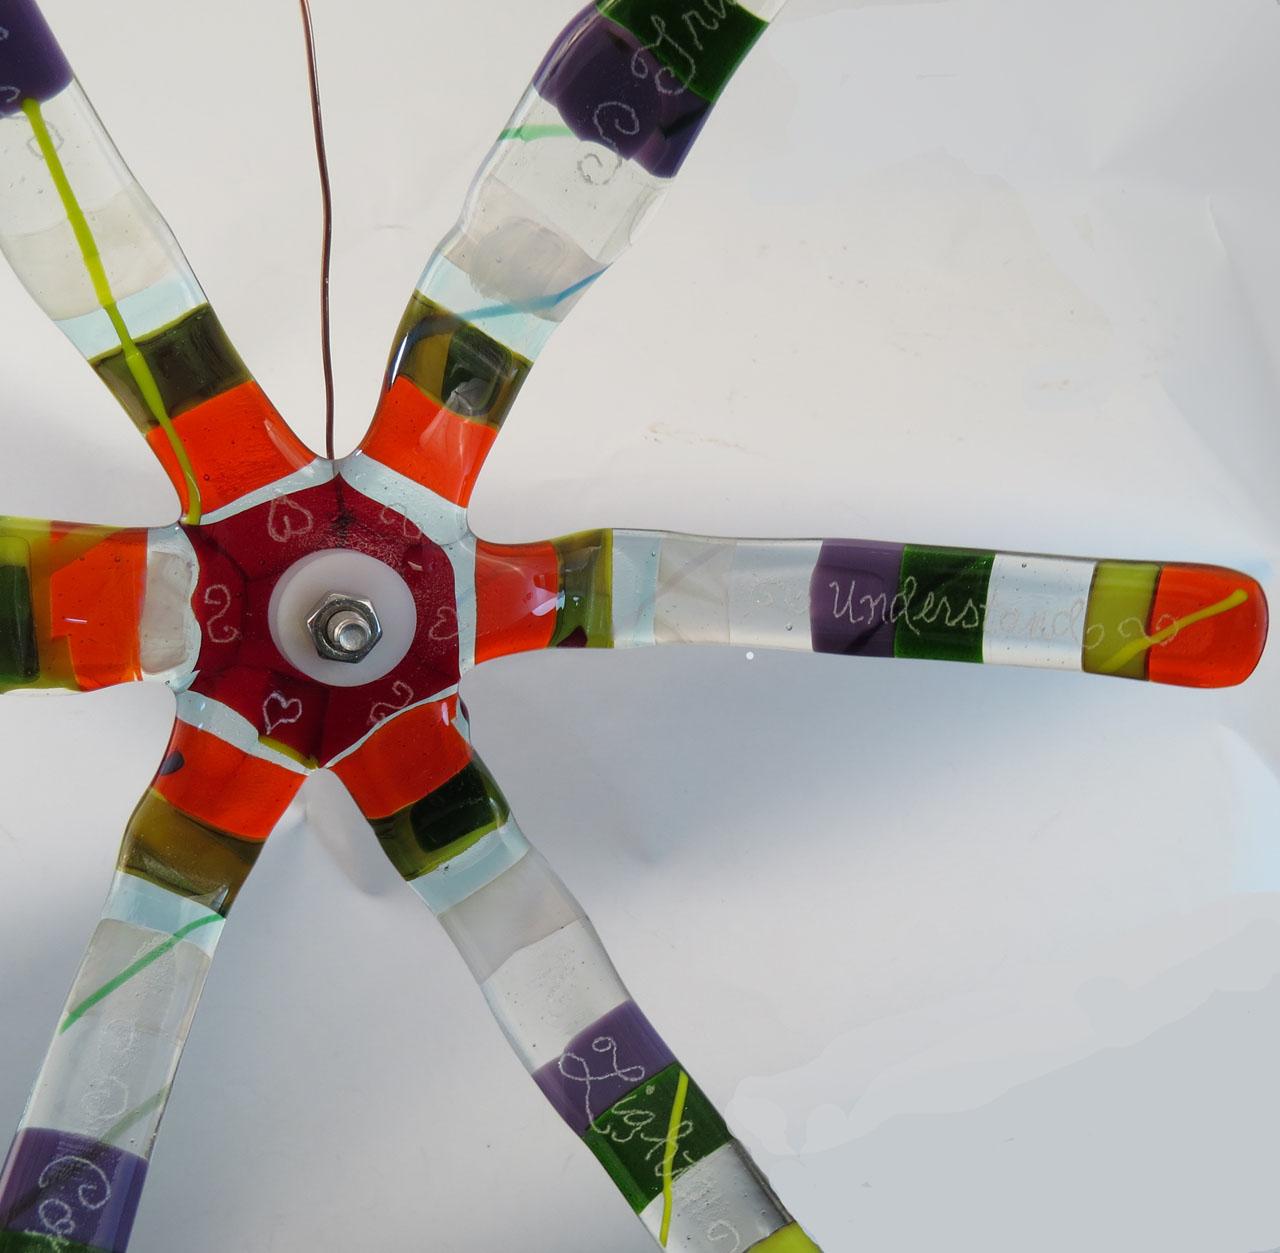 Color Umbrella of Peace-close-up